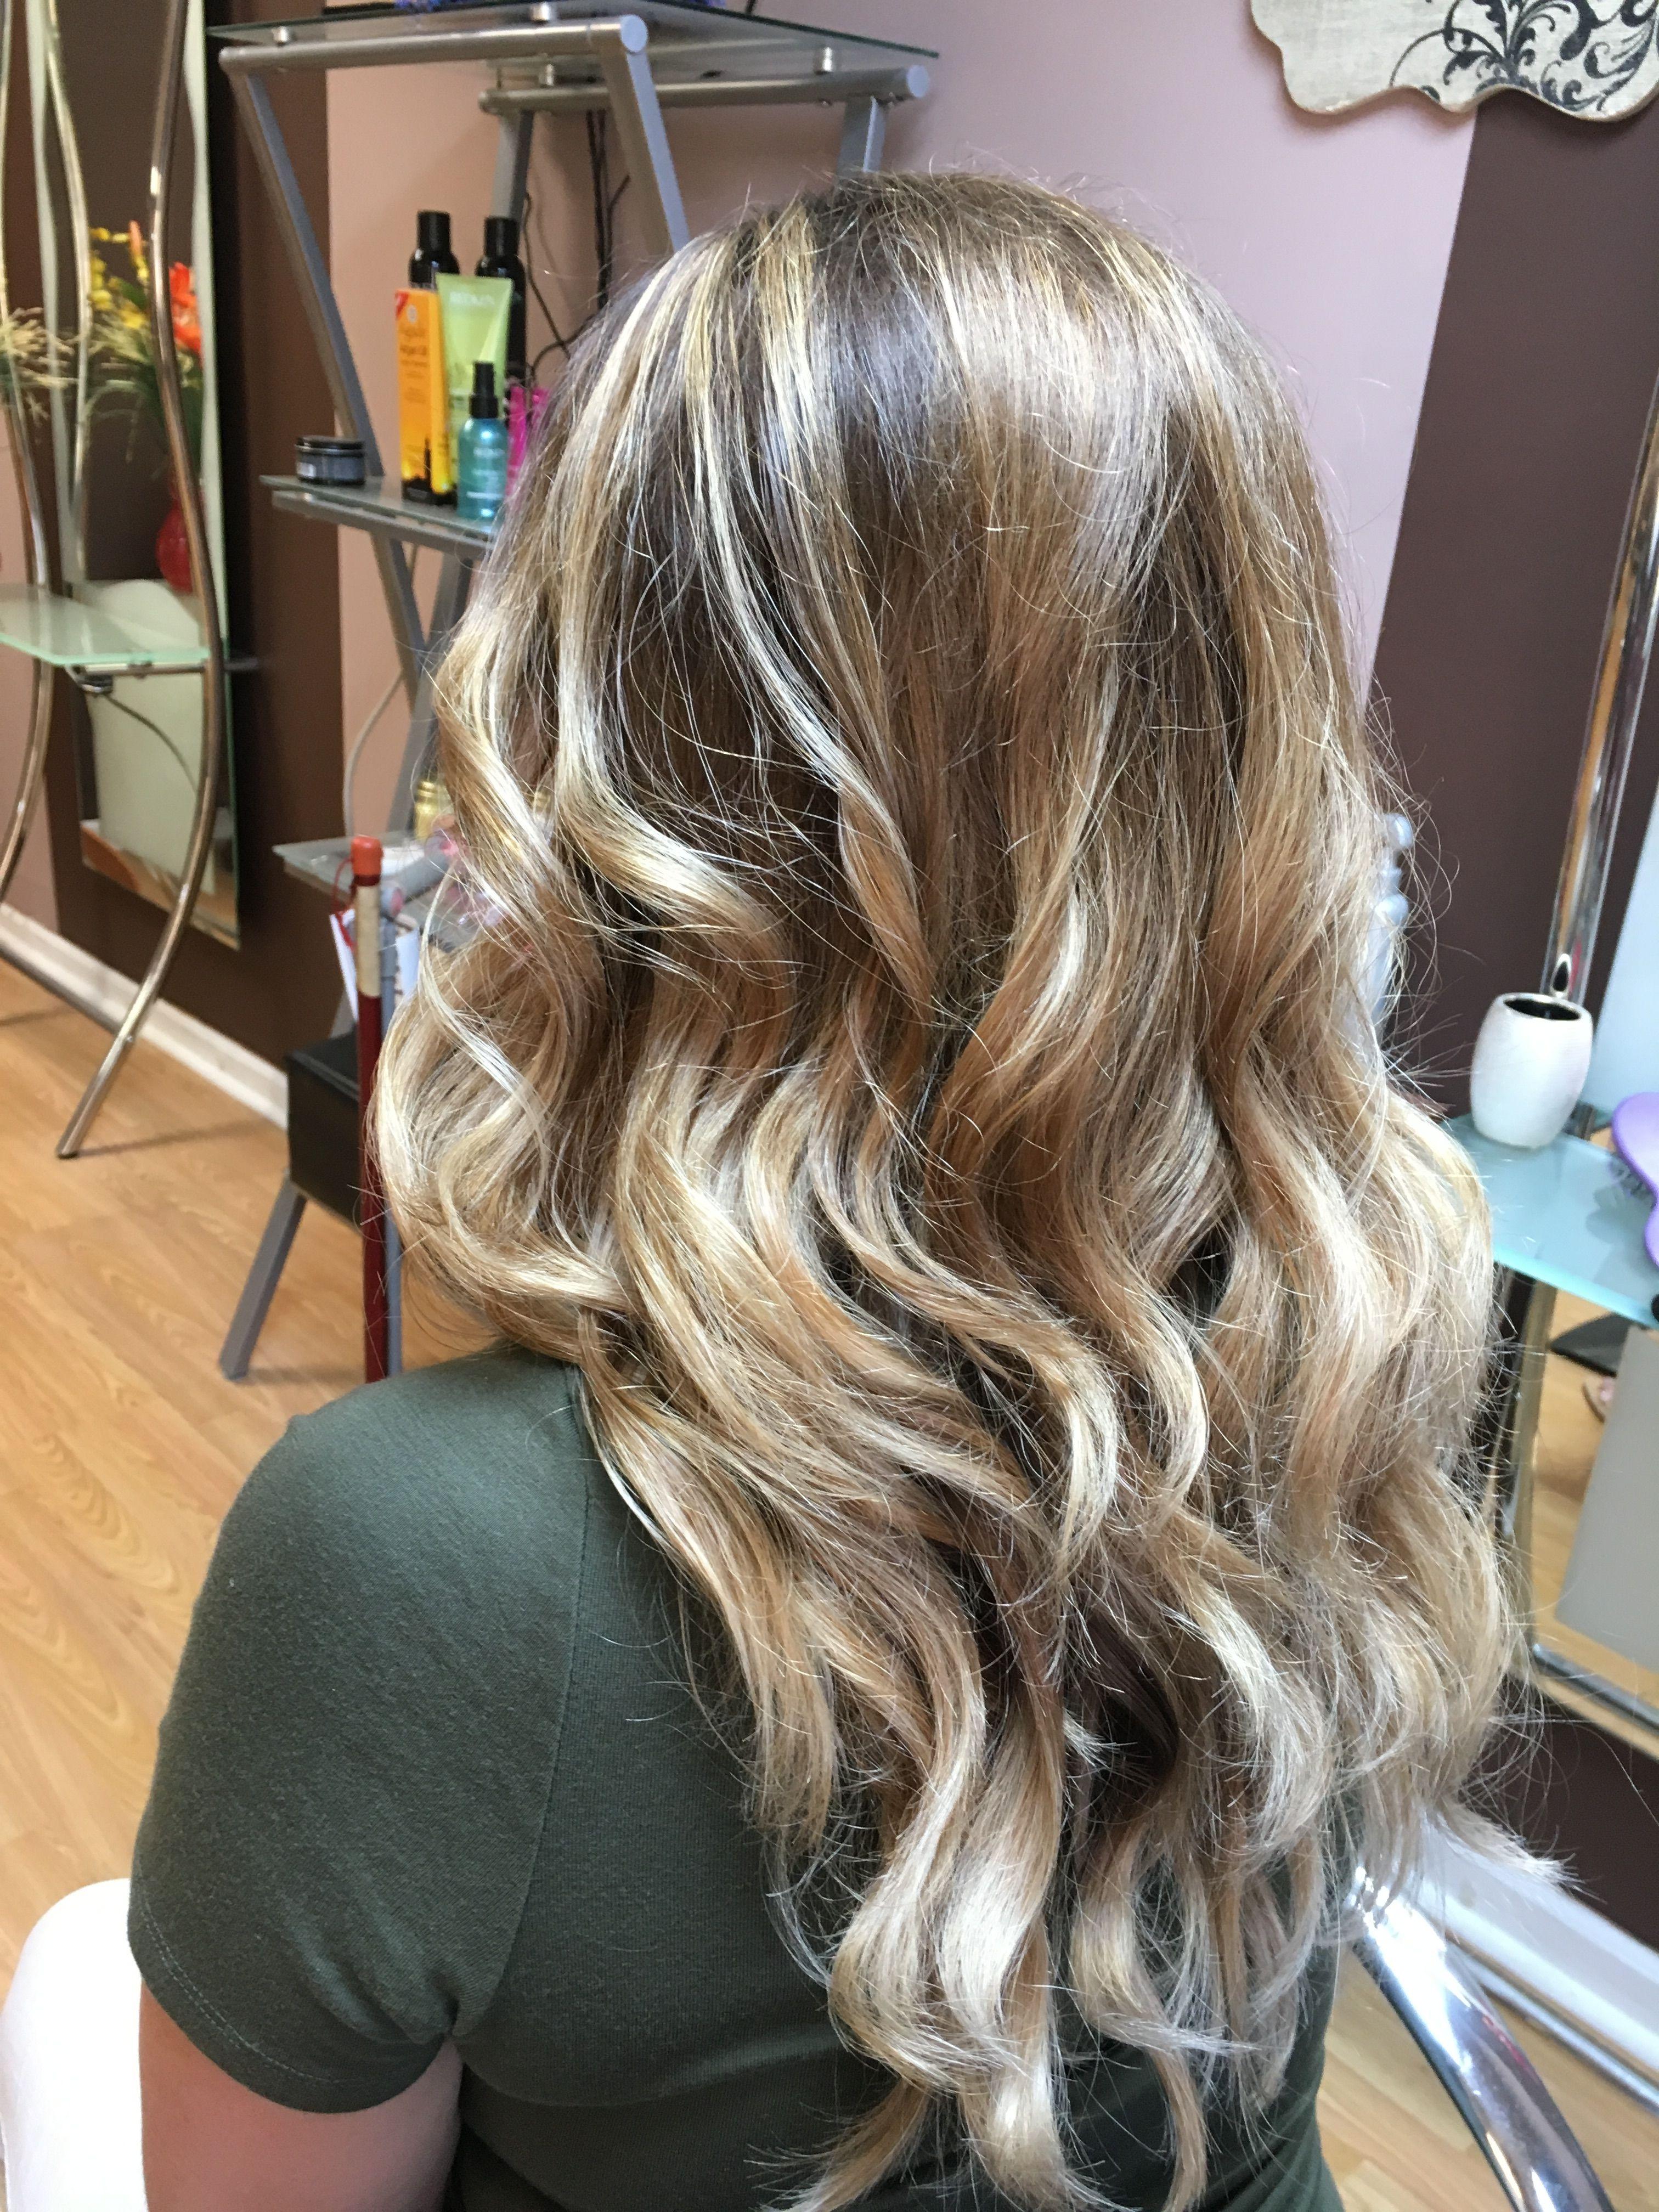 Pin by Lida Trumic on Studio16 Beauty Salon   Long hair ...